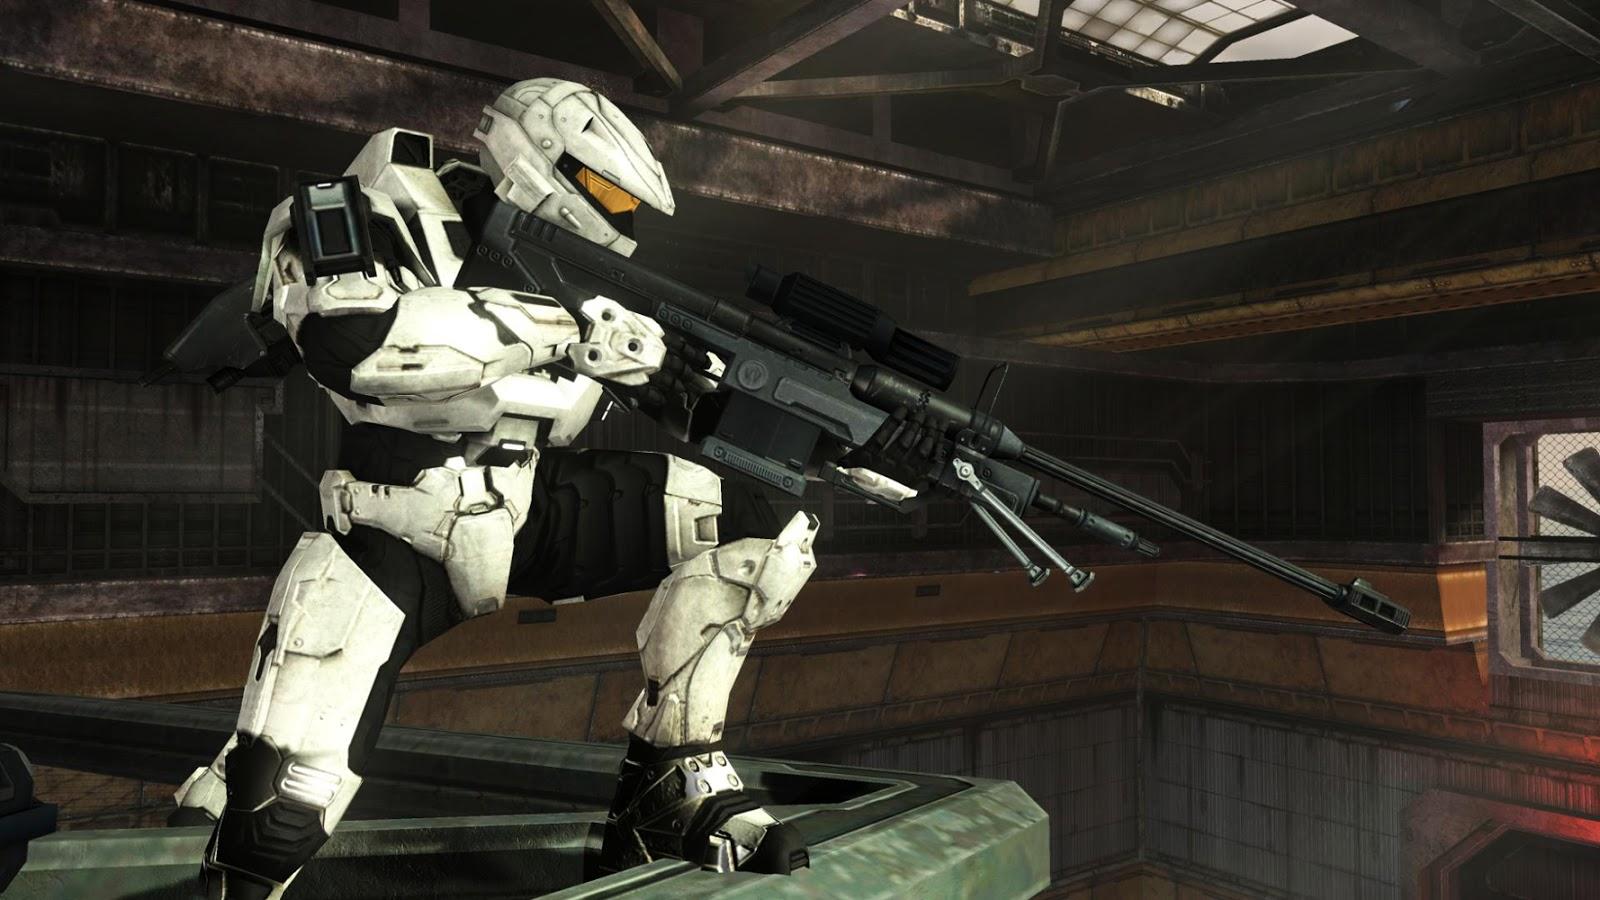 https://2.bp.blogspot.com/-FkE56YySwr4/UKZ2rSix8ZI/AAAAAAAAGHg/RnVhQ6nnWq4/s1600/Halo-Game-HD-Sniper-Wallpaper_Vvallpaper.Net.jpg